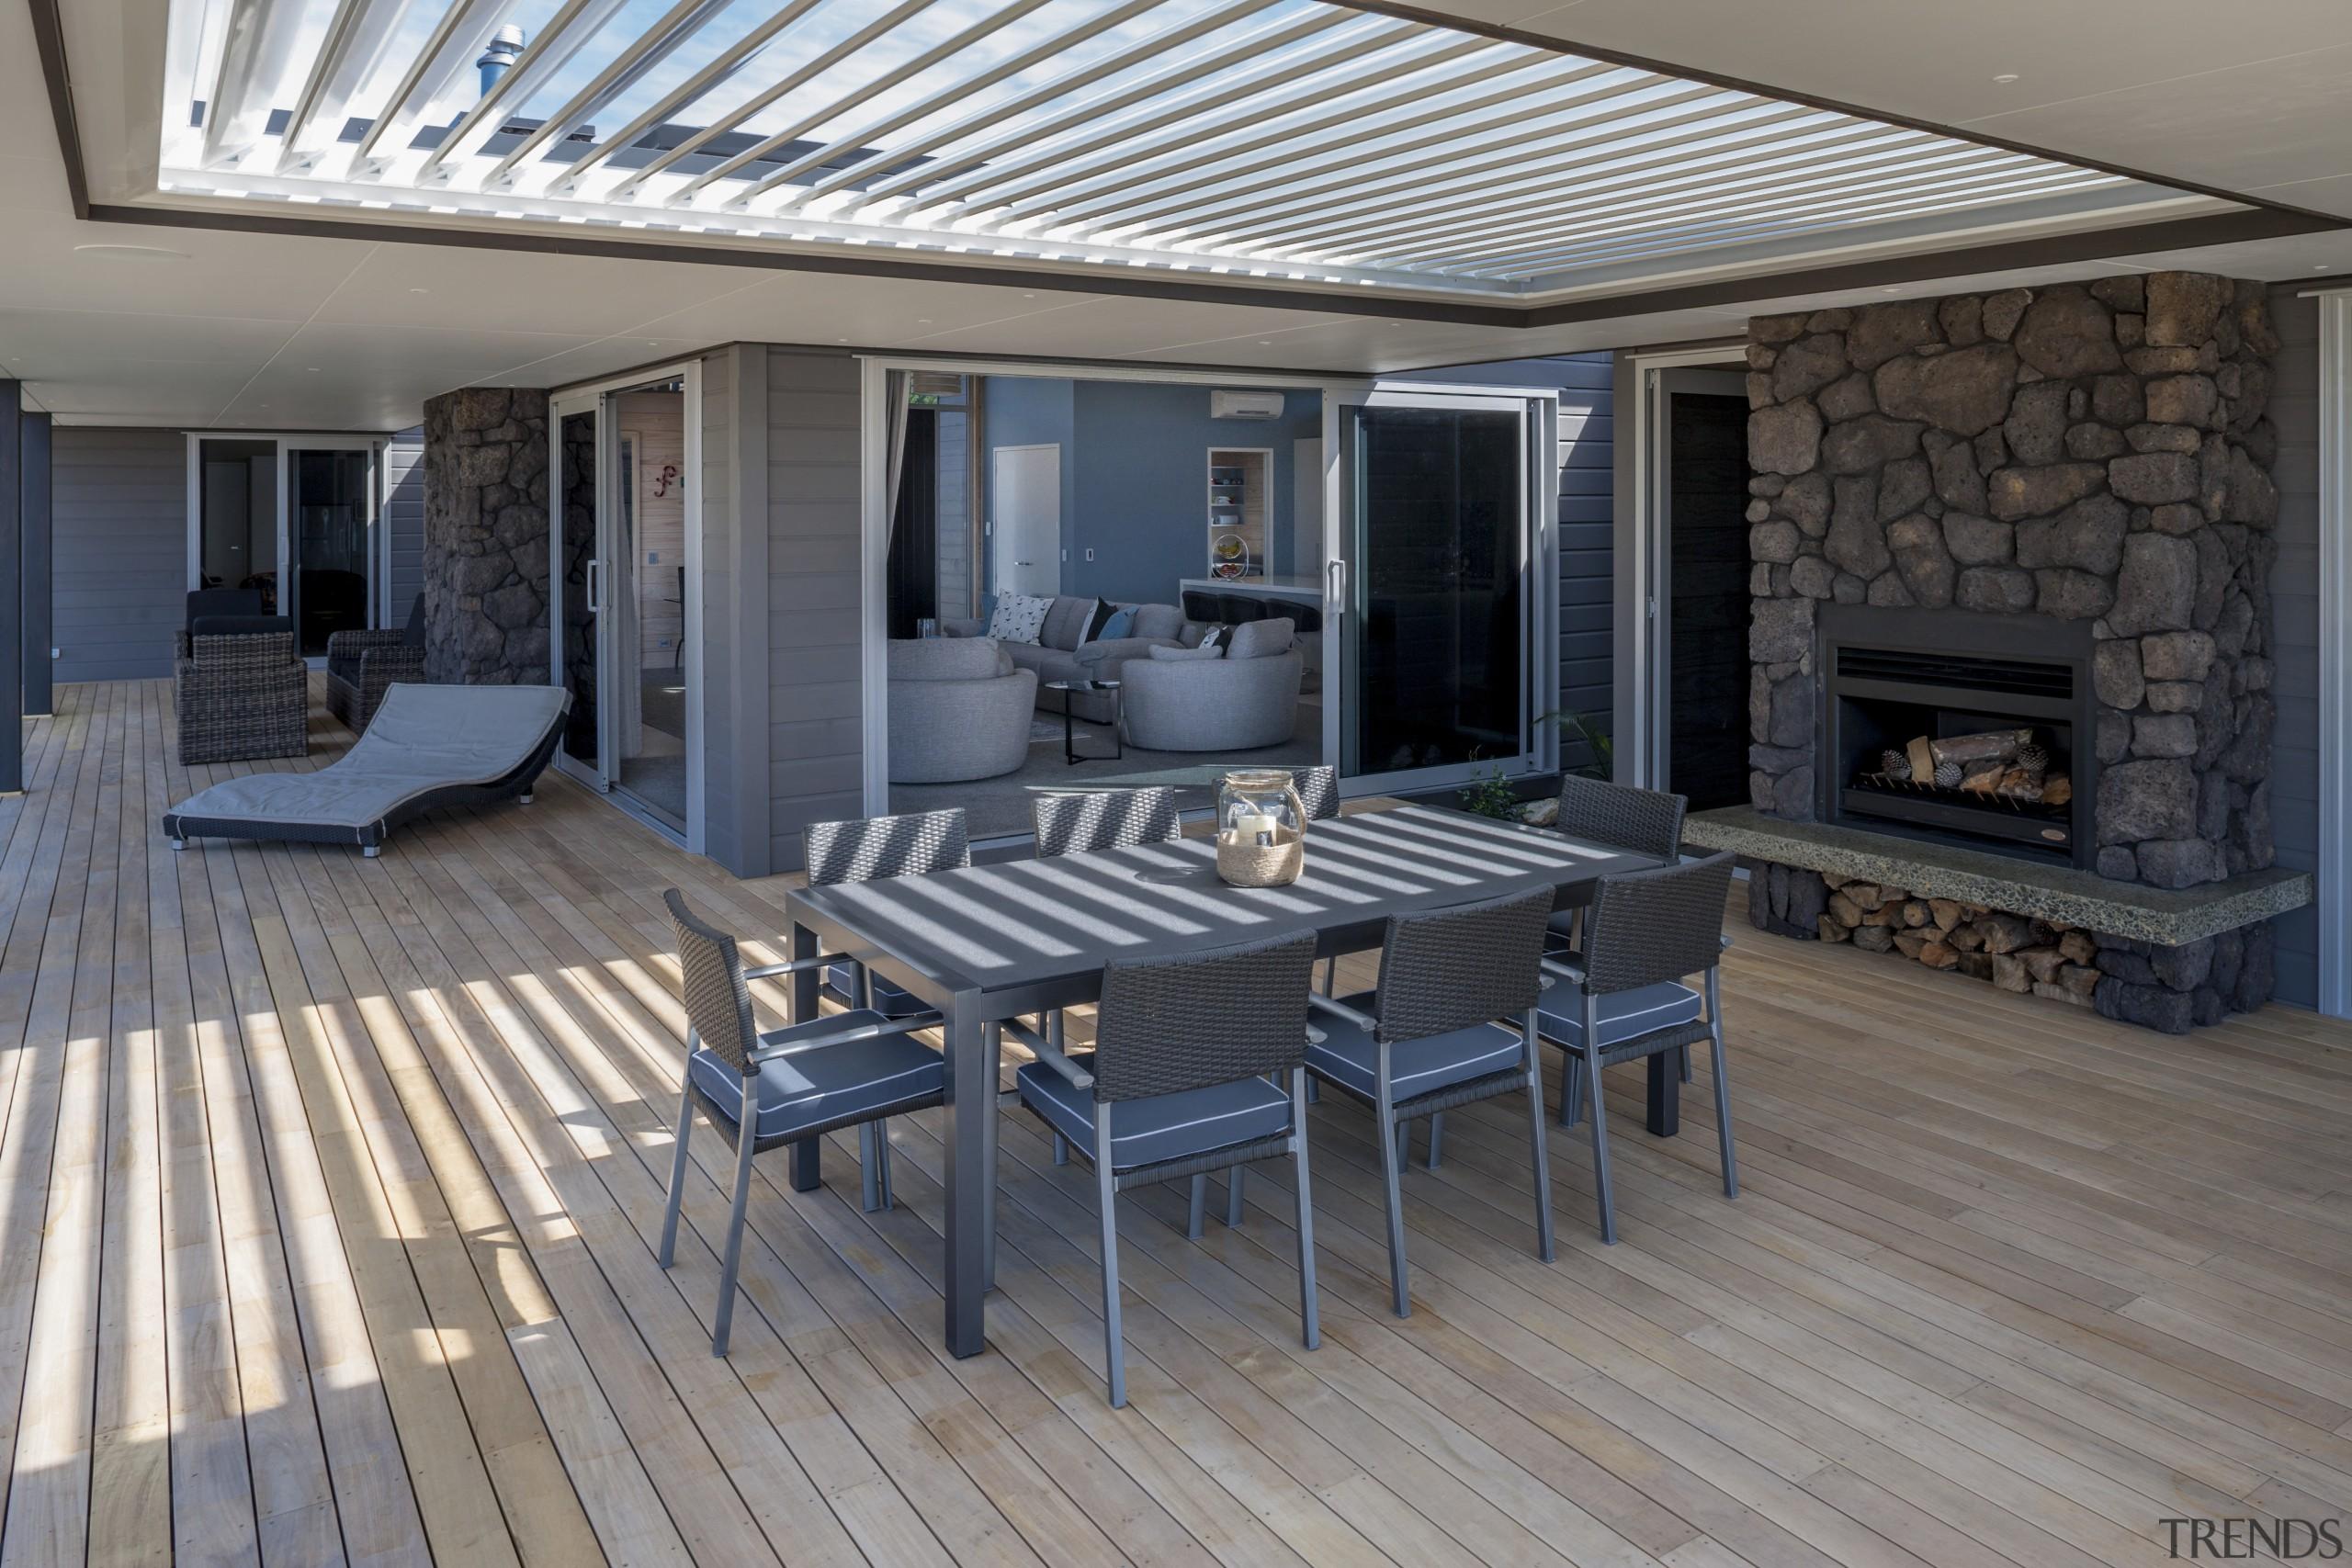 Lockwood Home built by Peter Richards - Lockwood deck, floor, flooring, interior design, patio, real estate, wood flooring, gray, black